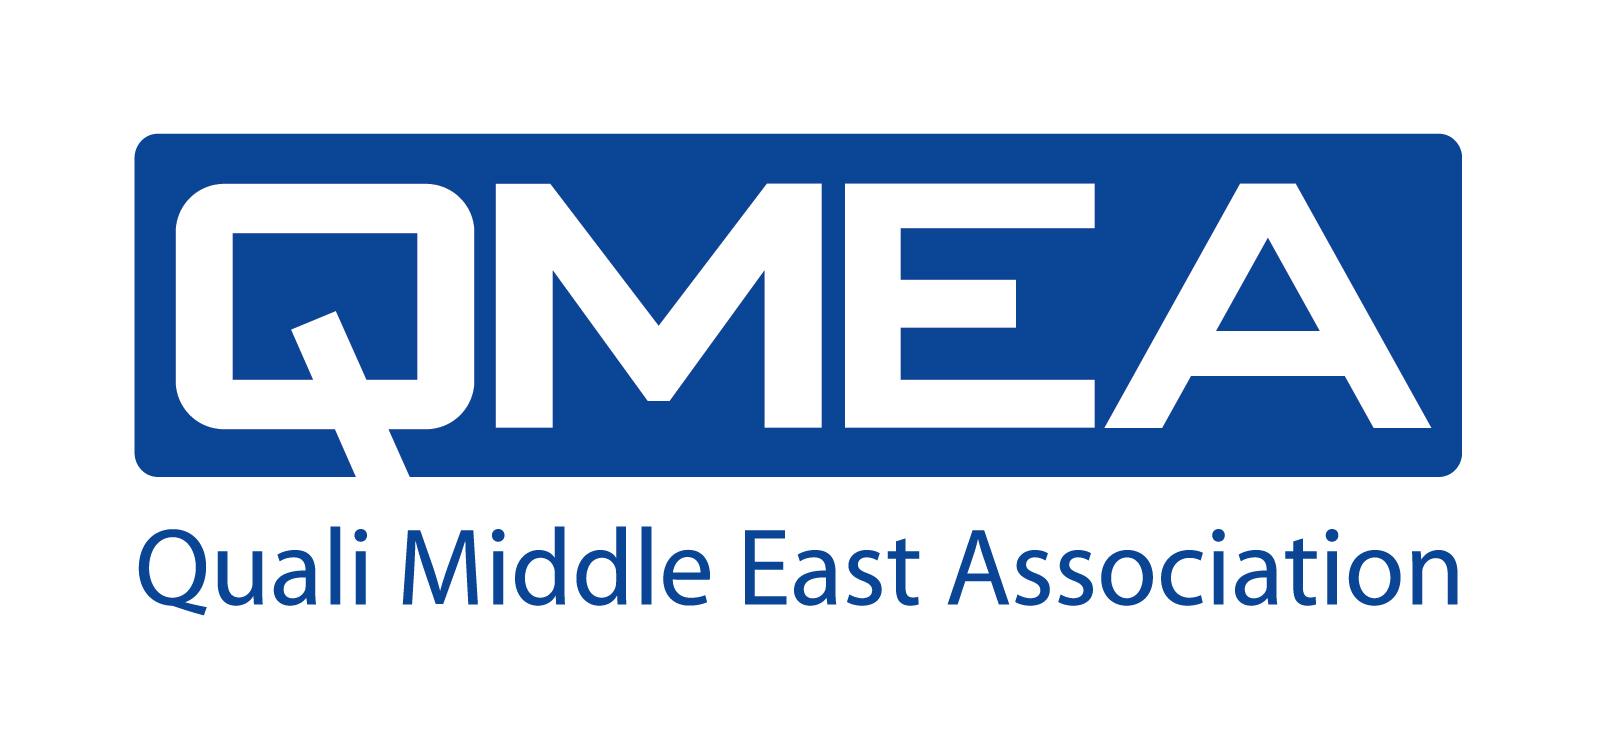 Member Associations - QUALICOAT